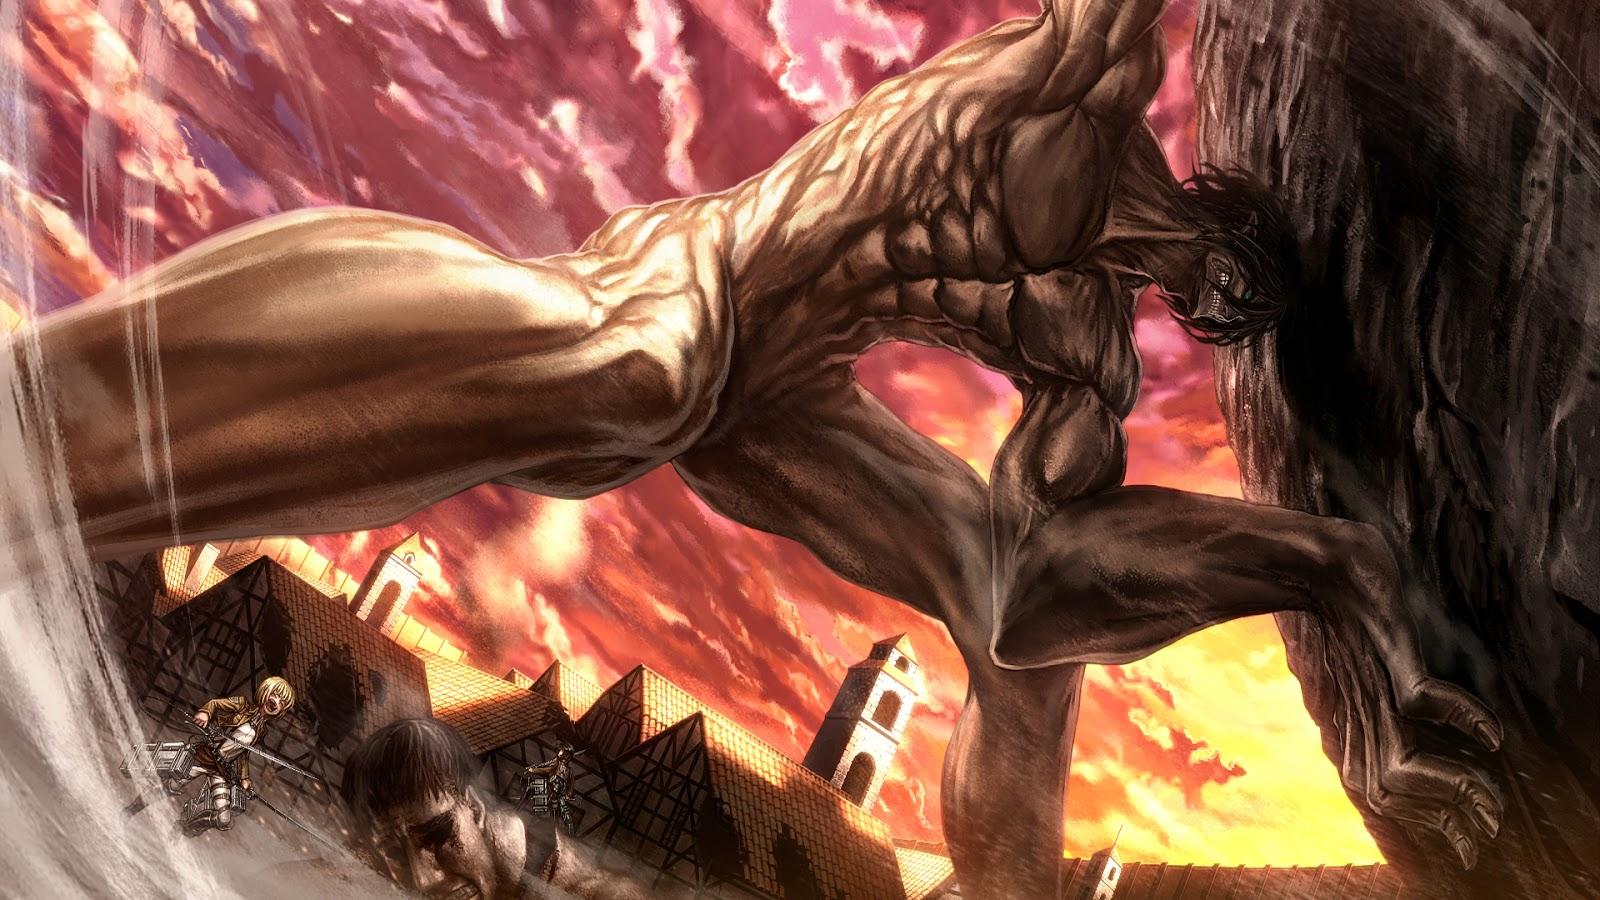 Eren titan form mikasa ackerman armin arlert shingeki no kyojin attack 1600x900